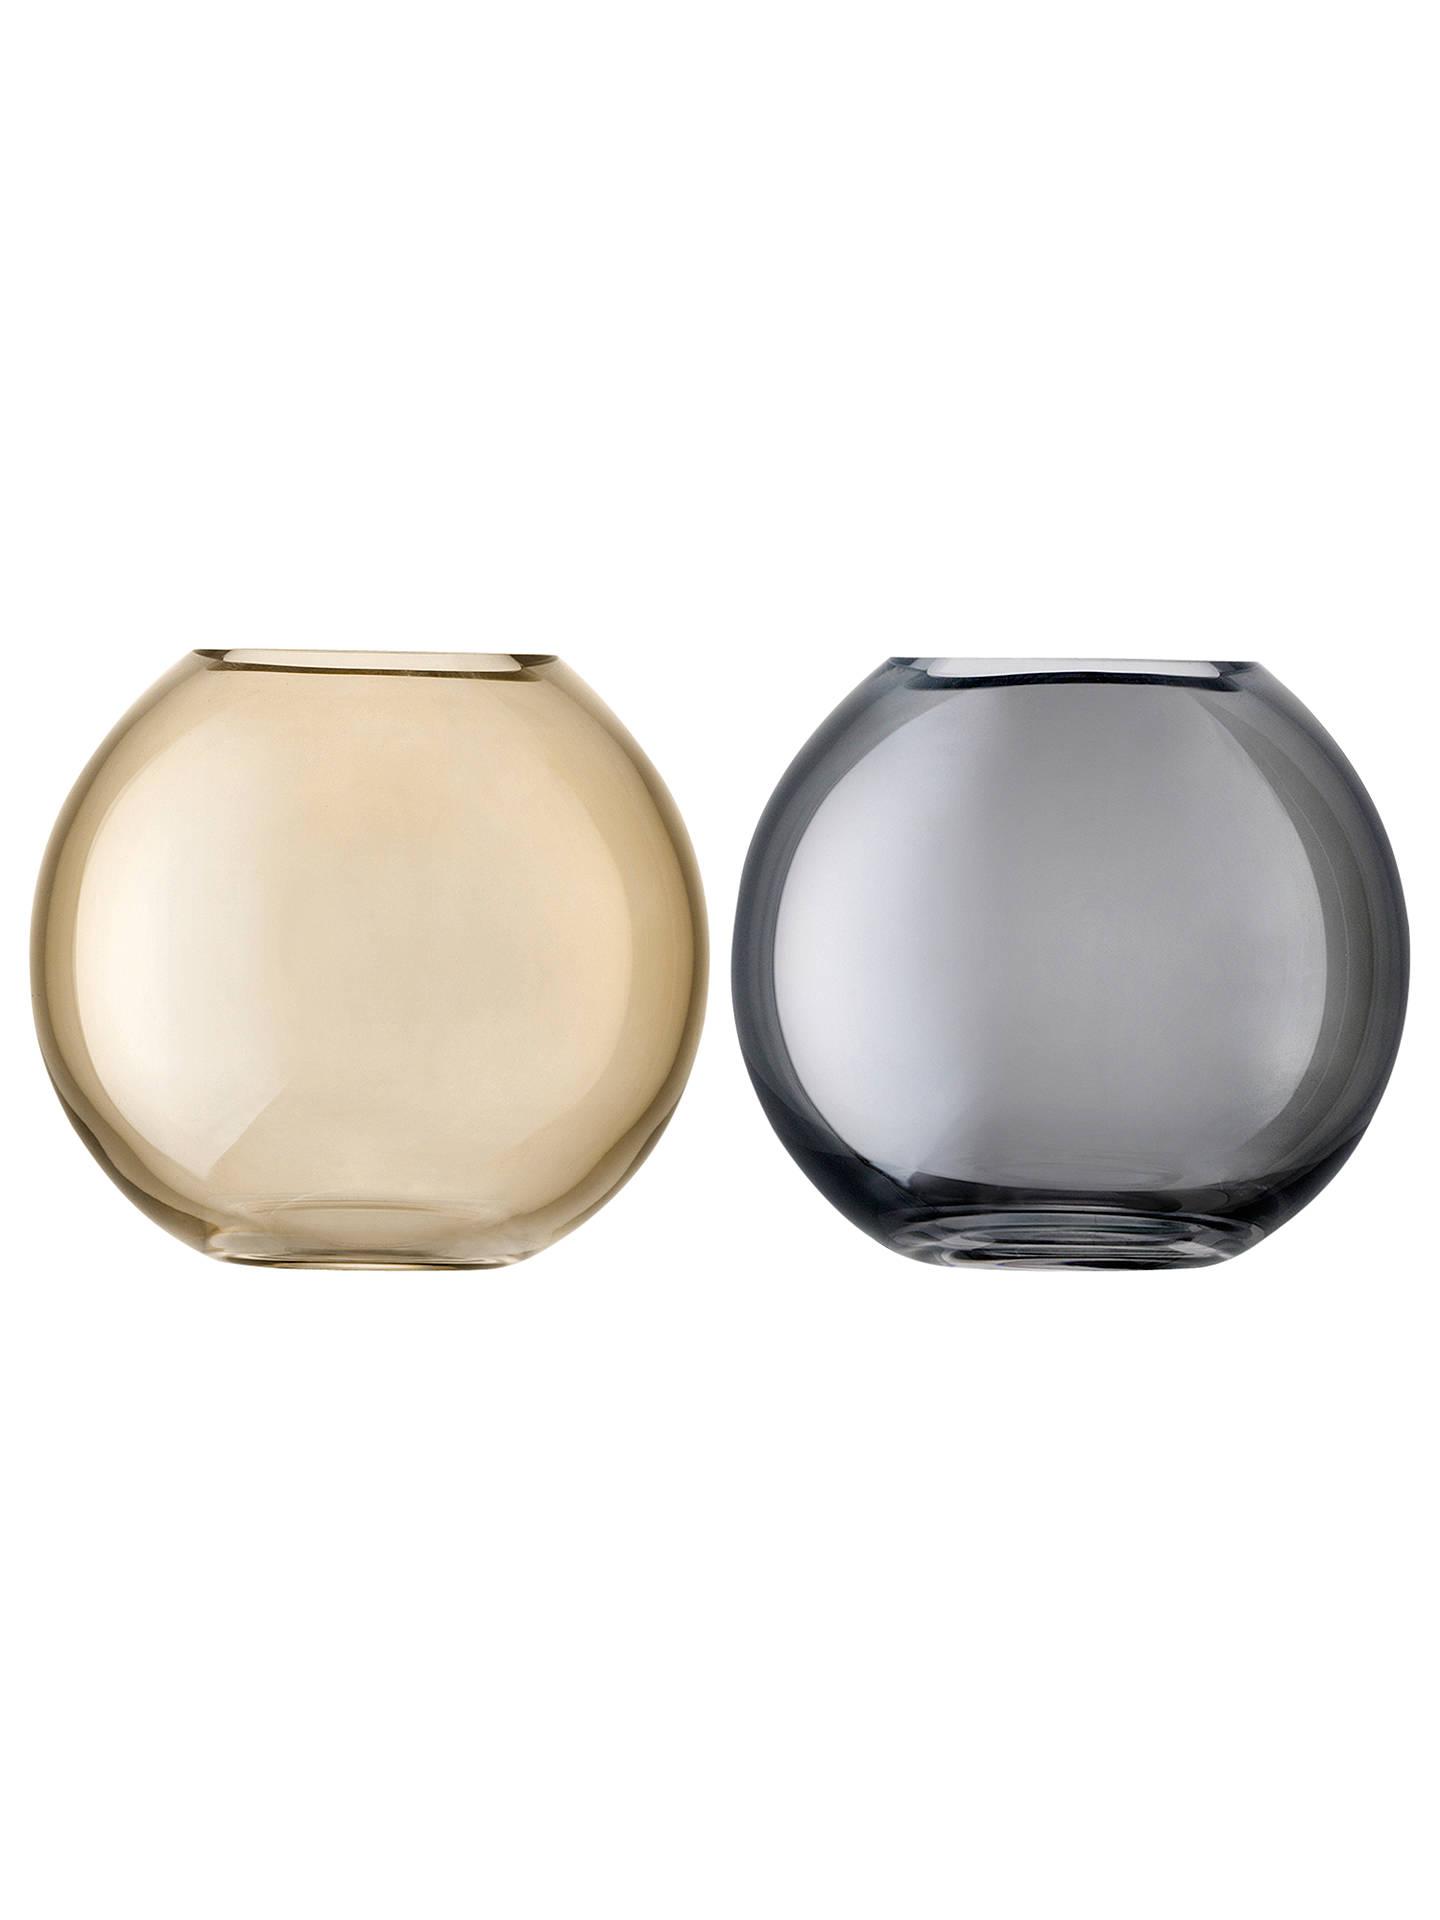 Lsa International Polka Vase Duo, H11cm, Bronze & Zinc by Lsa International